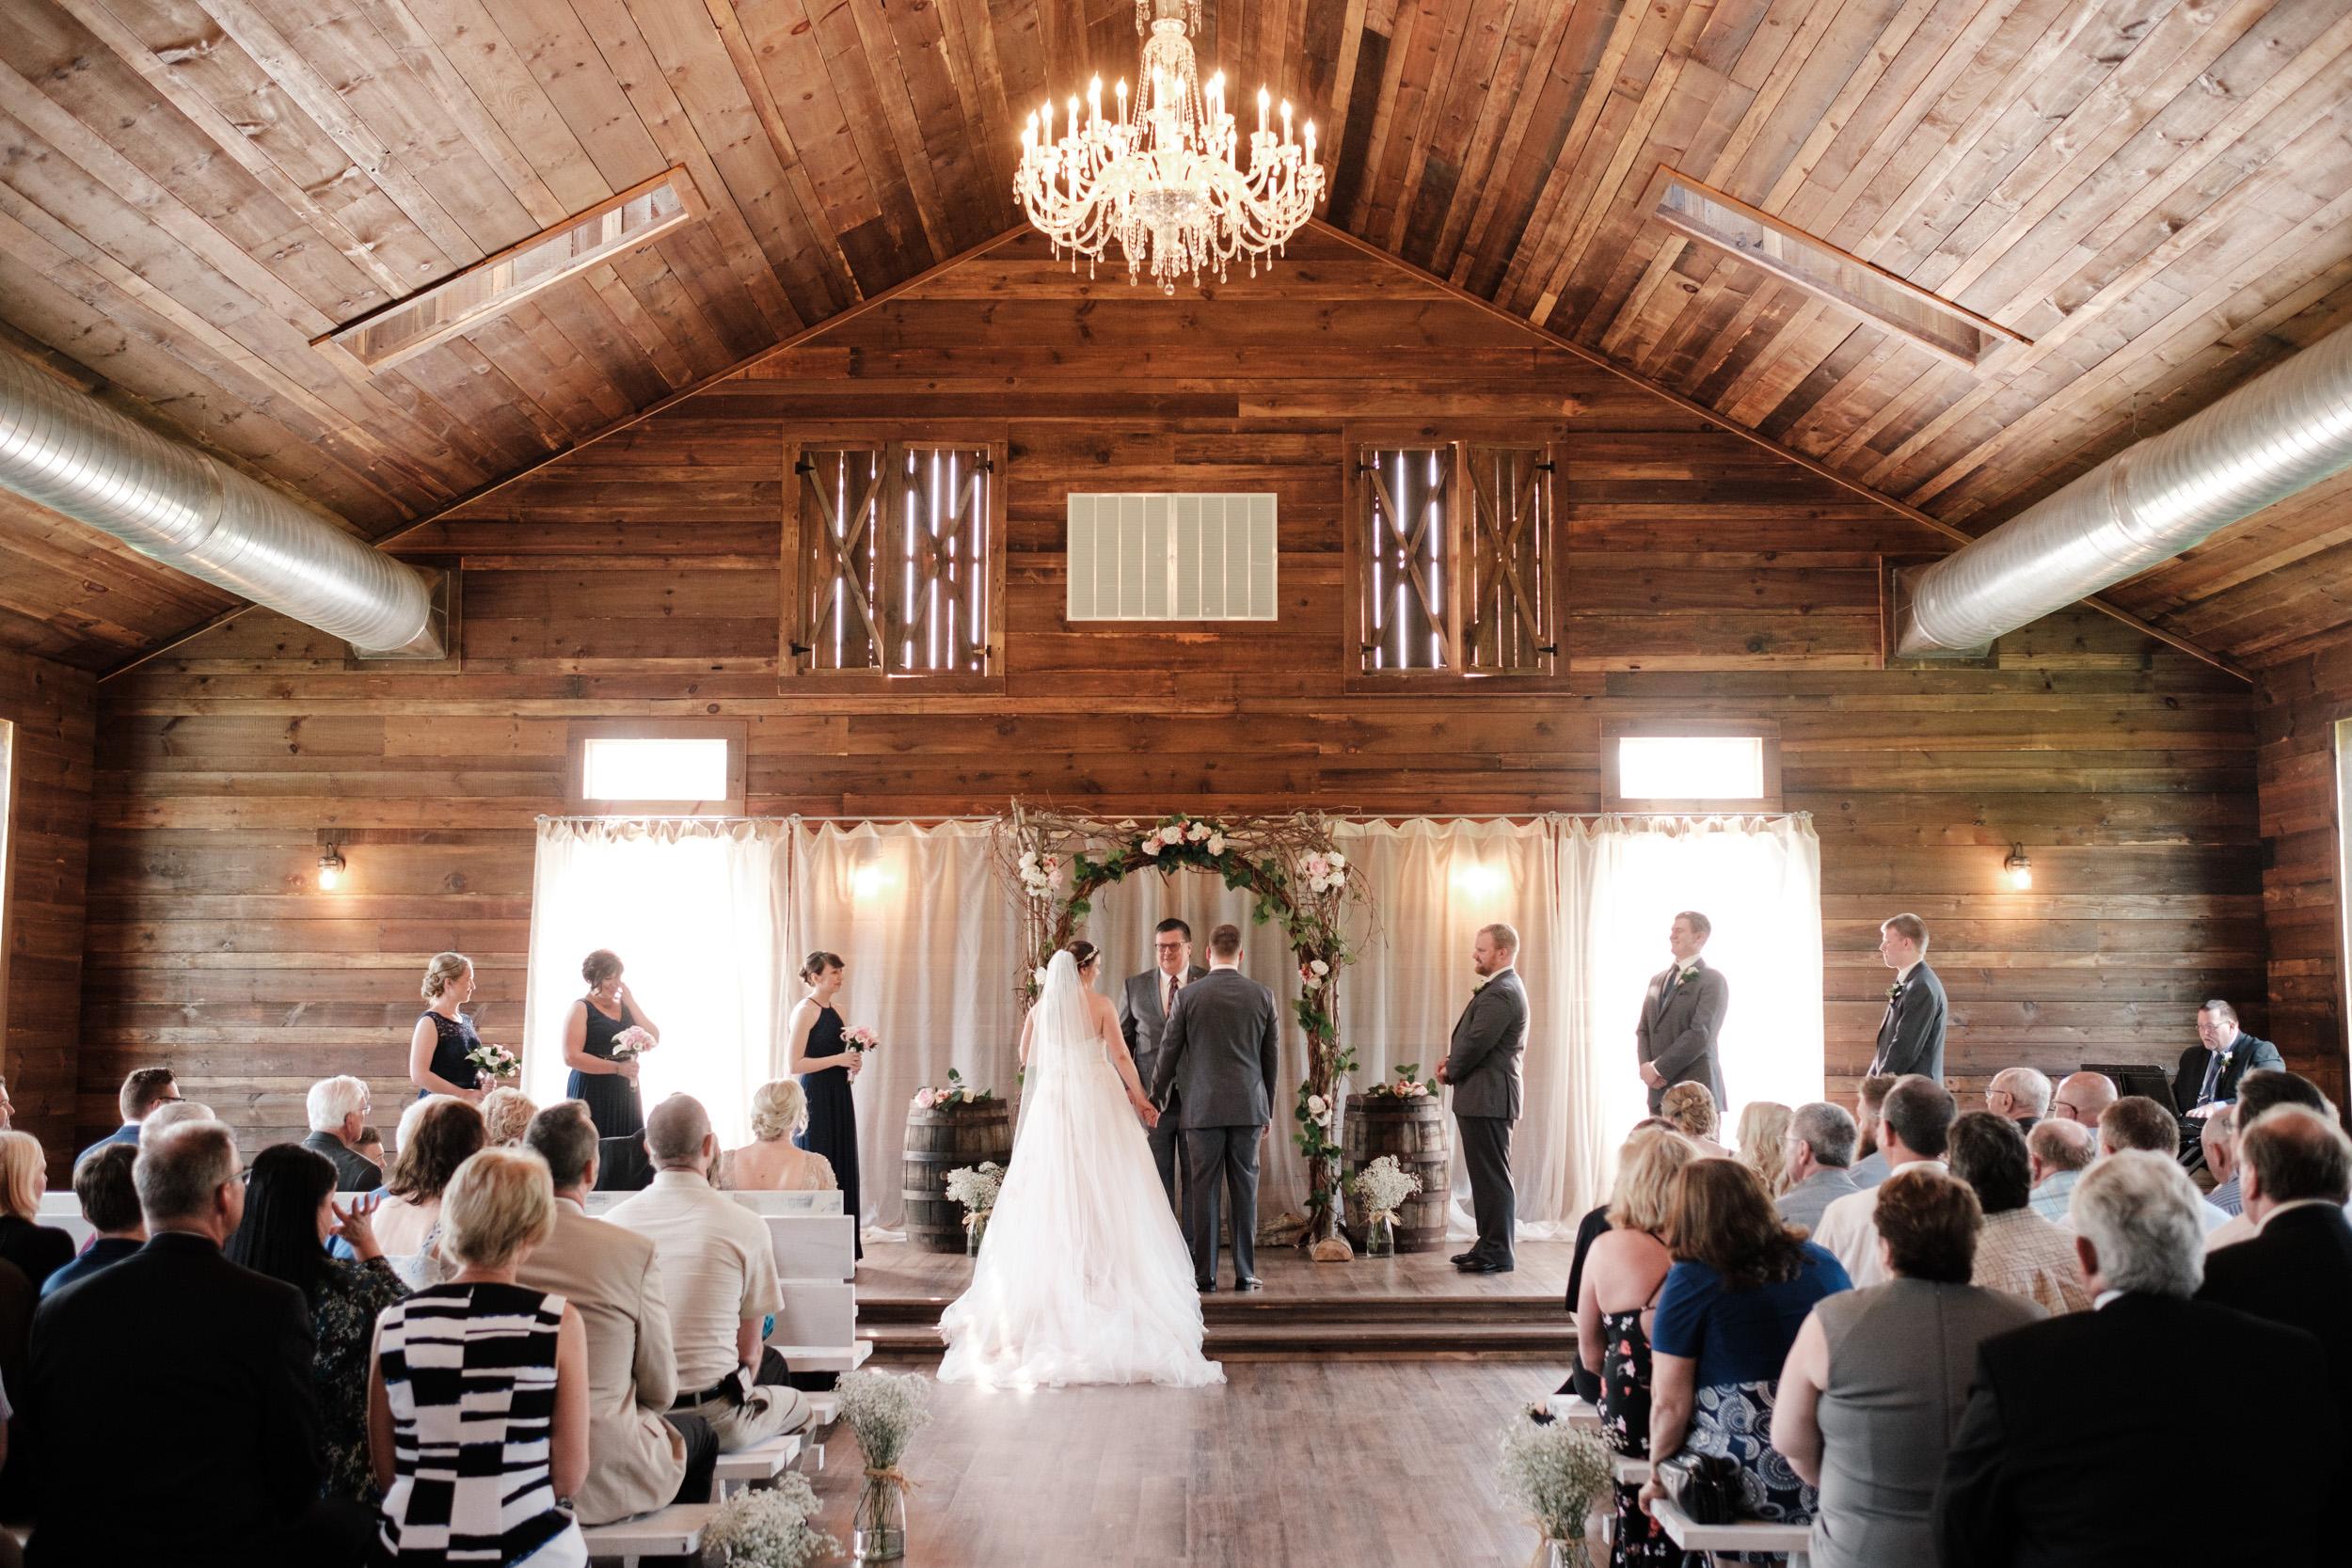 19-06-22-Ryan-Katie-The-Fields-Reserve-Wedding-23.jpg